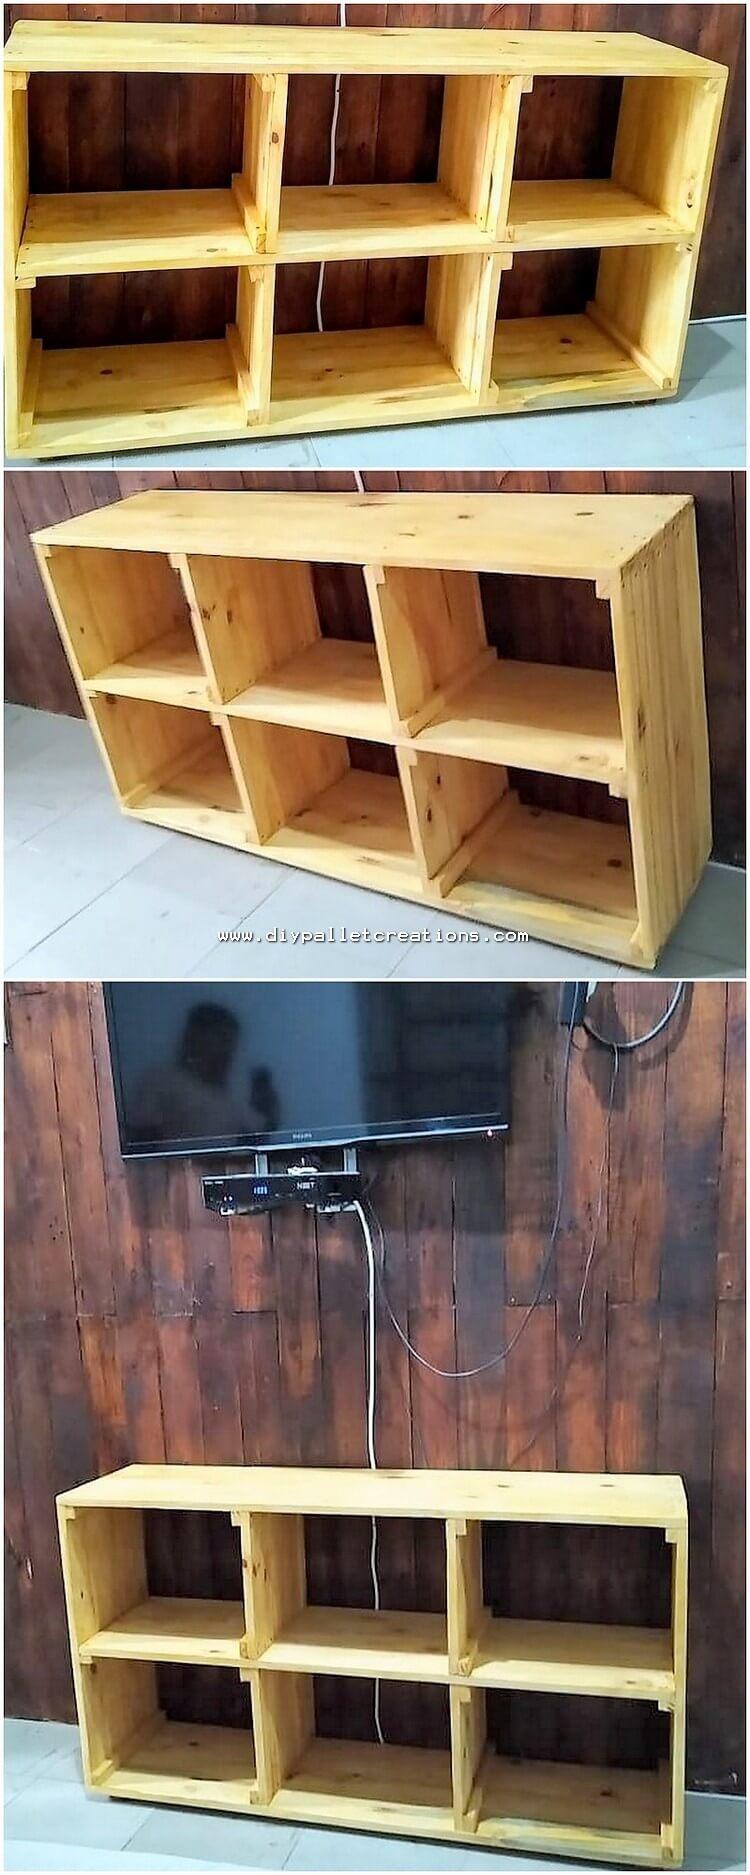 Pallet Media Shelving Cabinet